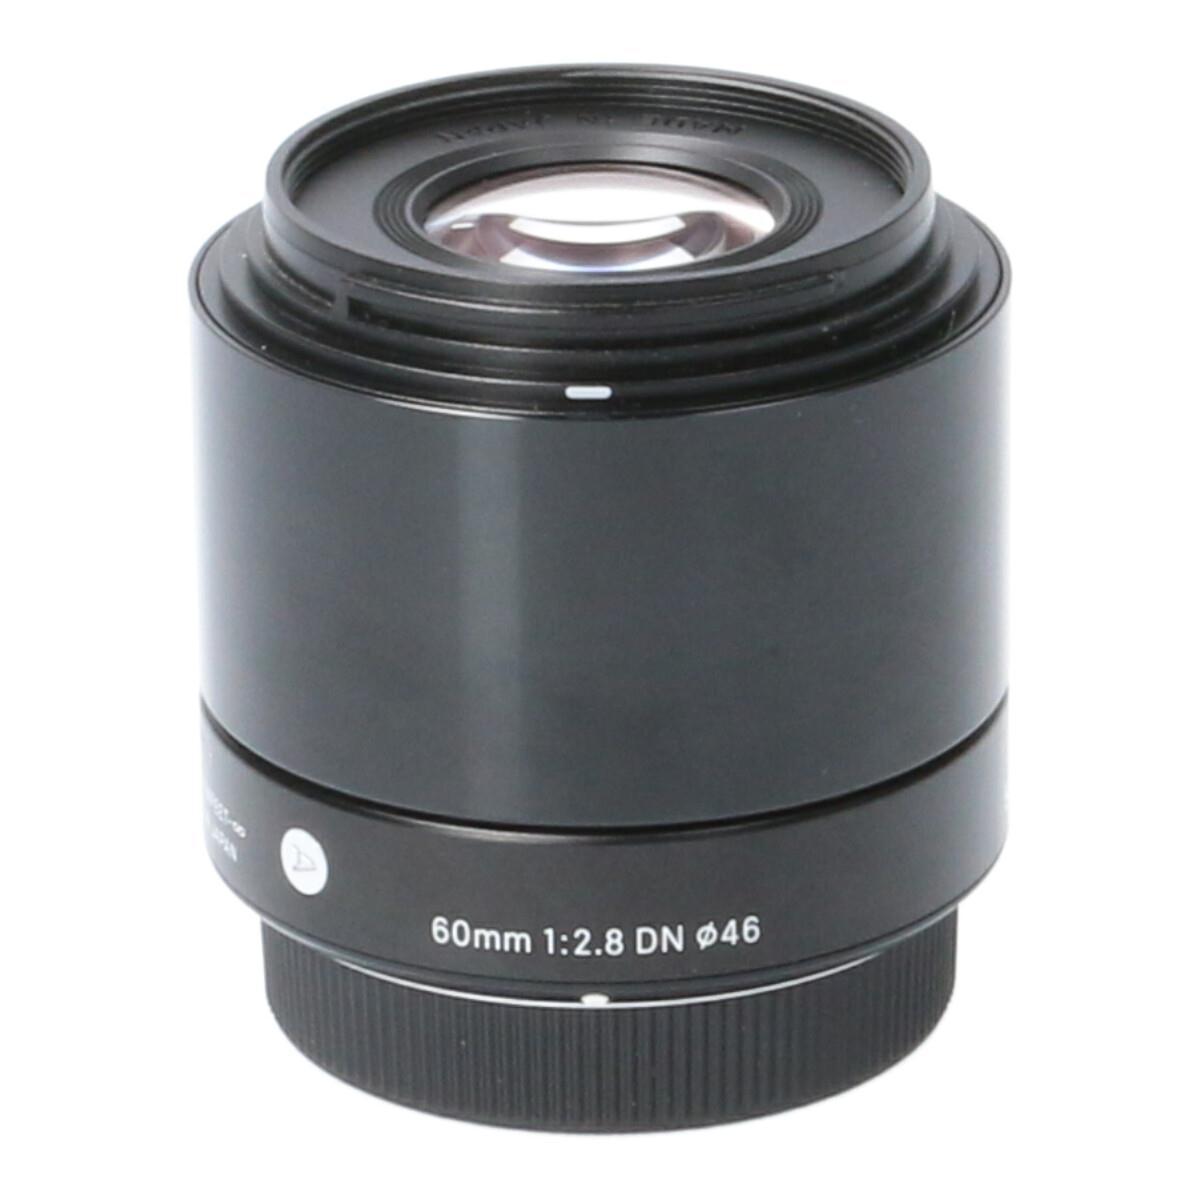 SIGMA MFT(A)60mm F2.8DN【中古】